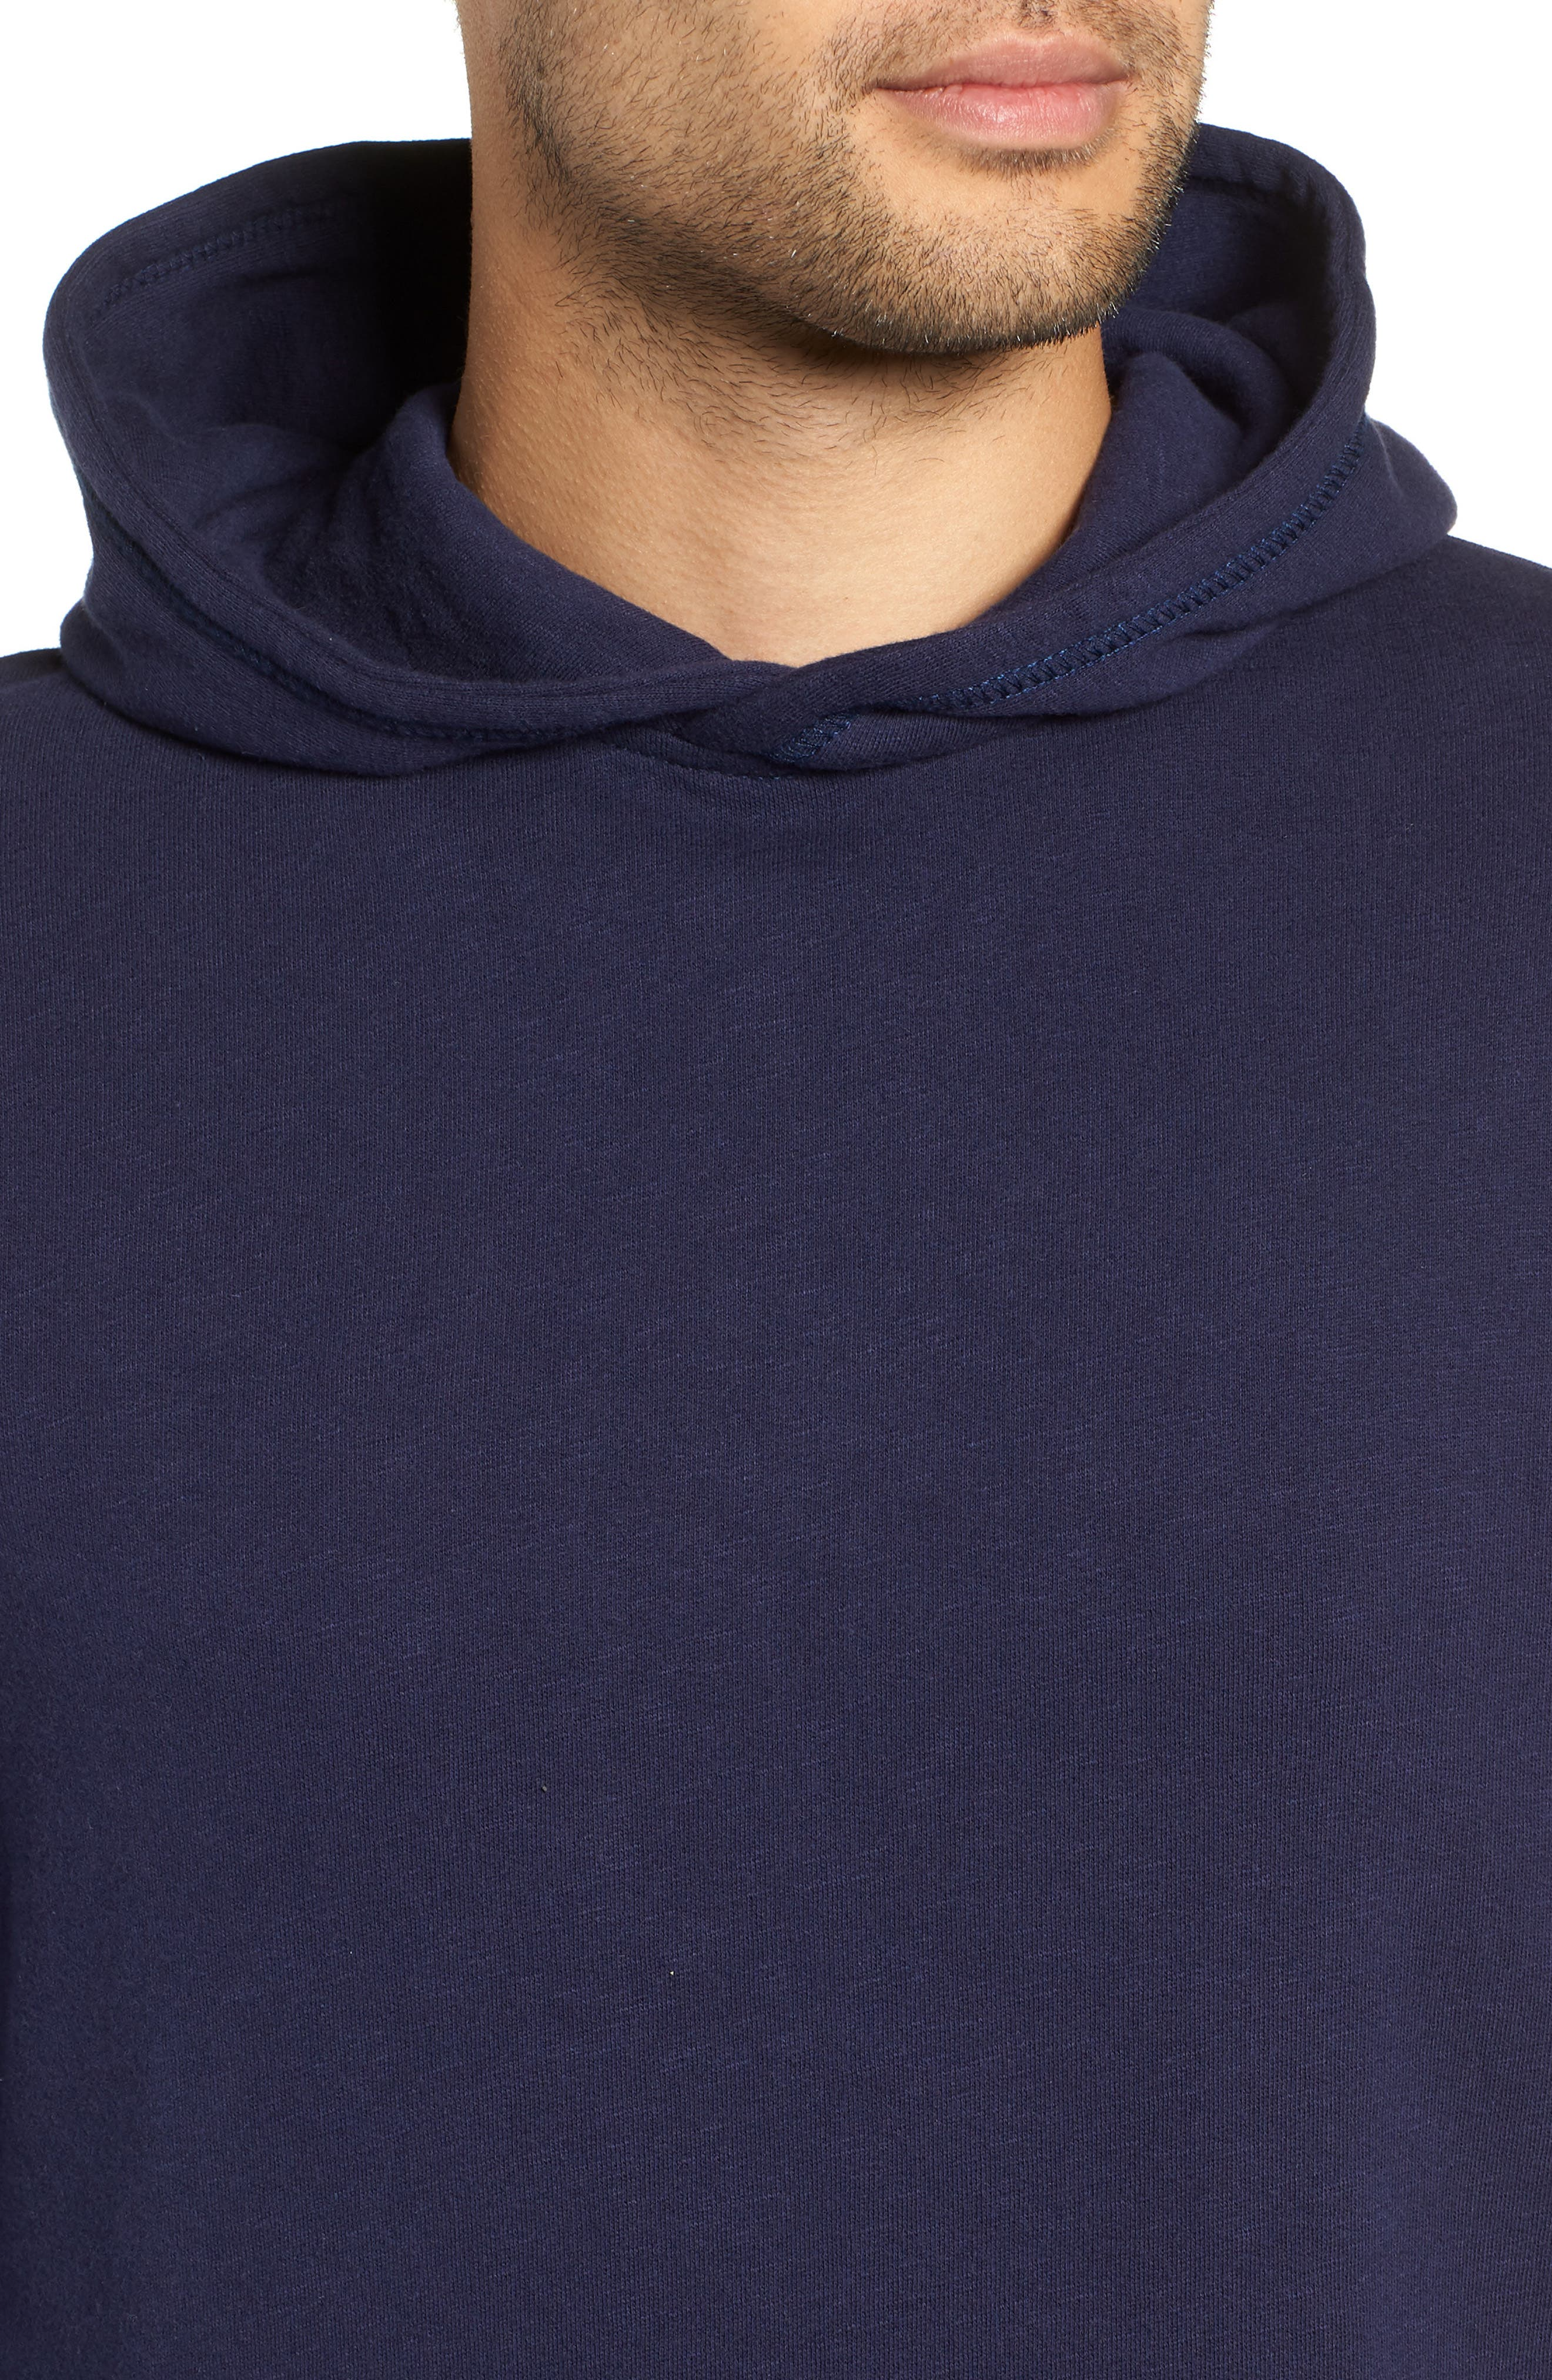 THE RAIL,                             Hooded Sweatshirt,                             Alternate thumbnail 4, color,                             410